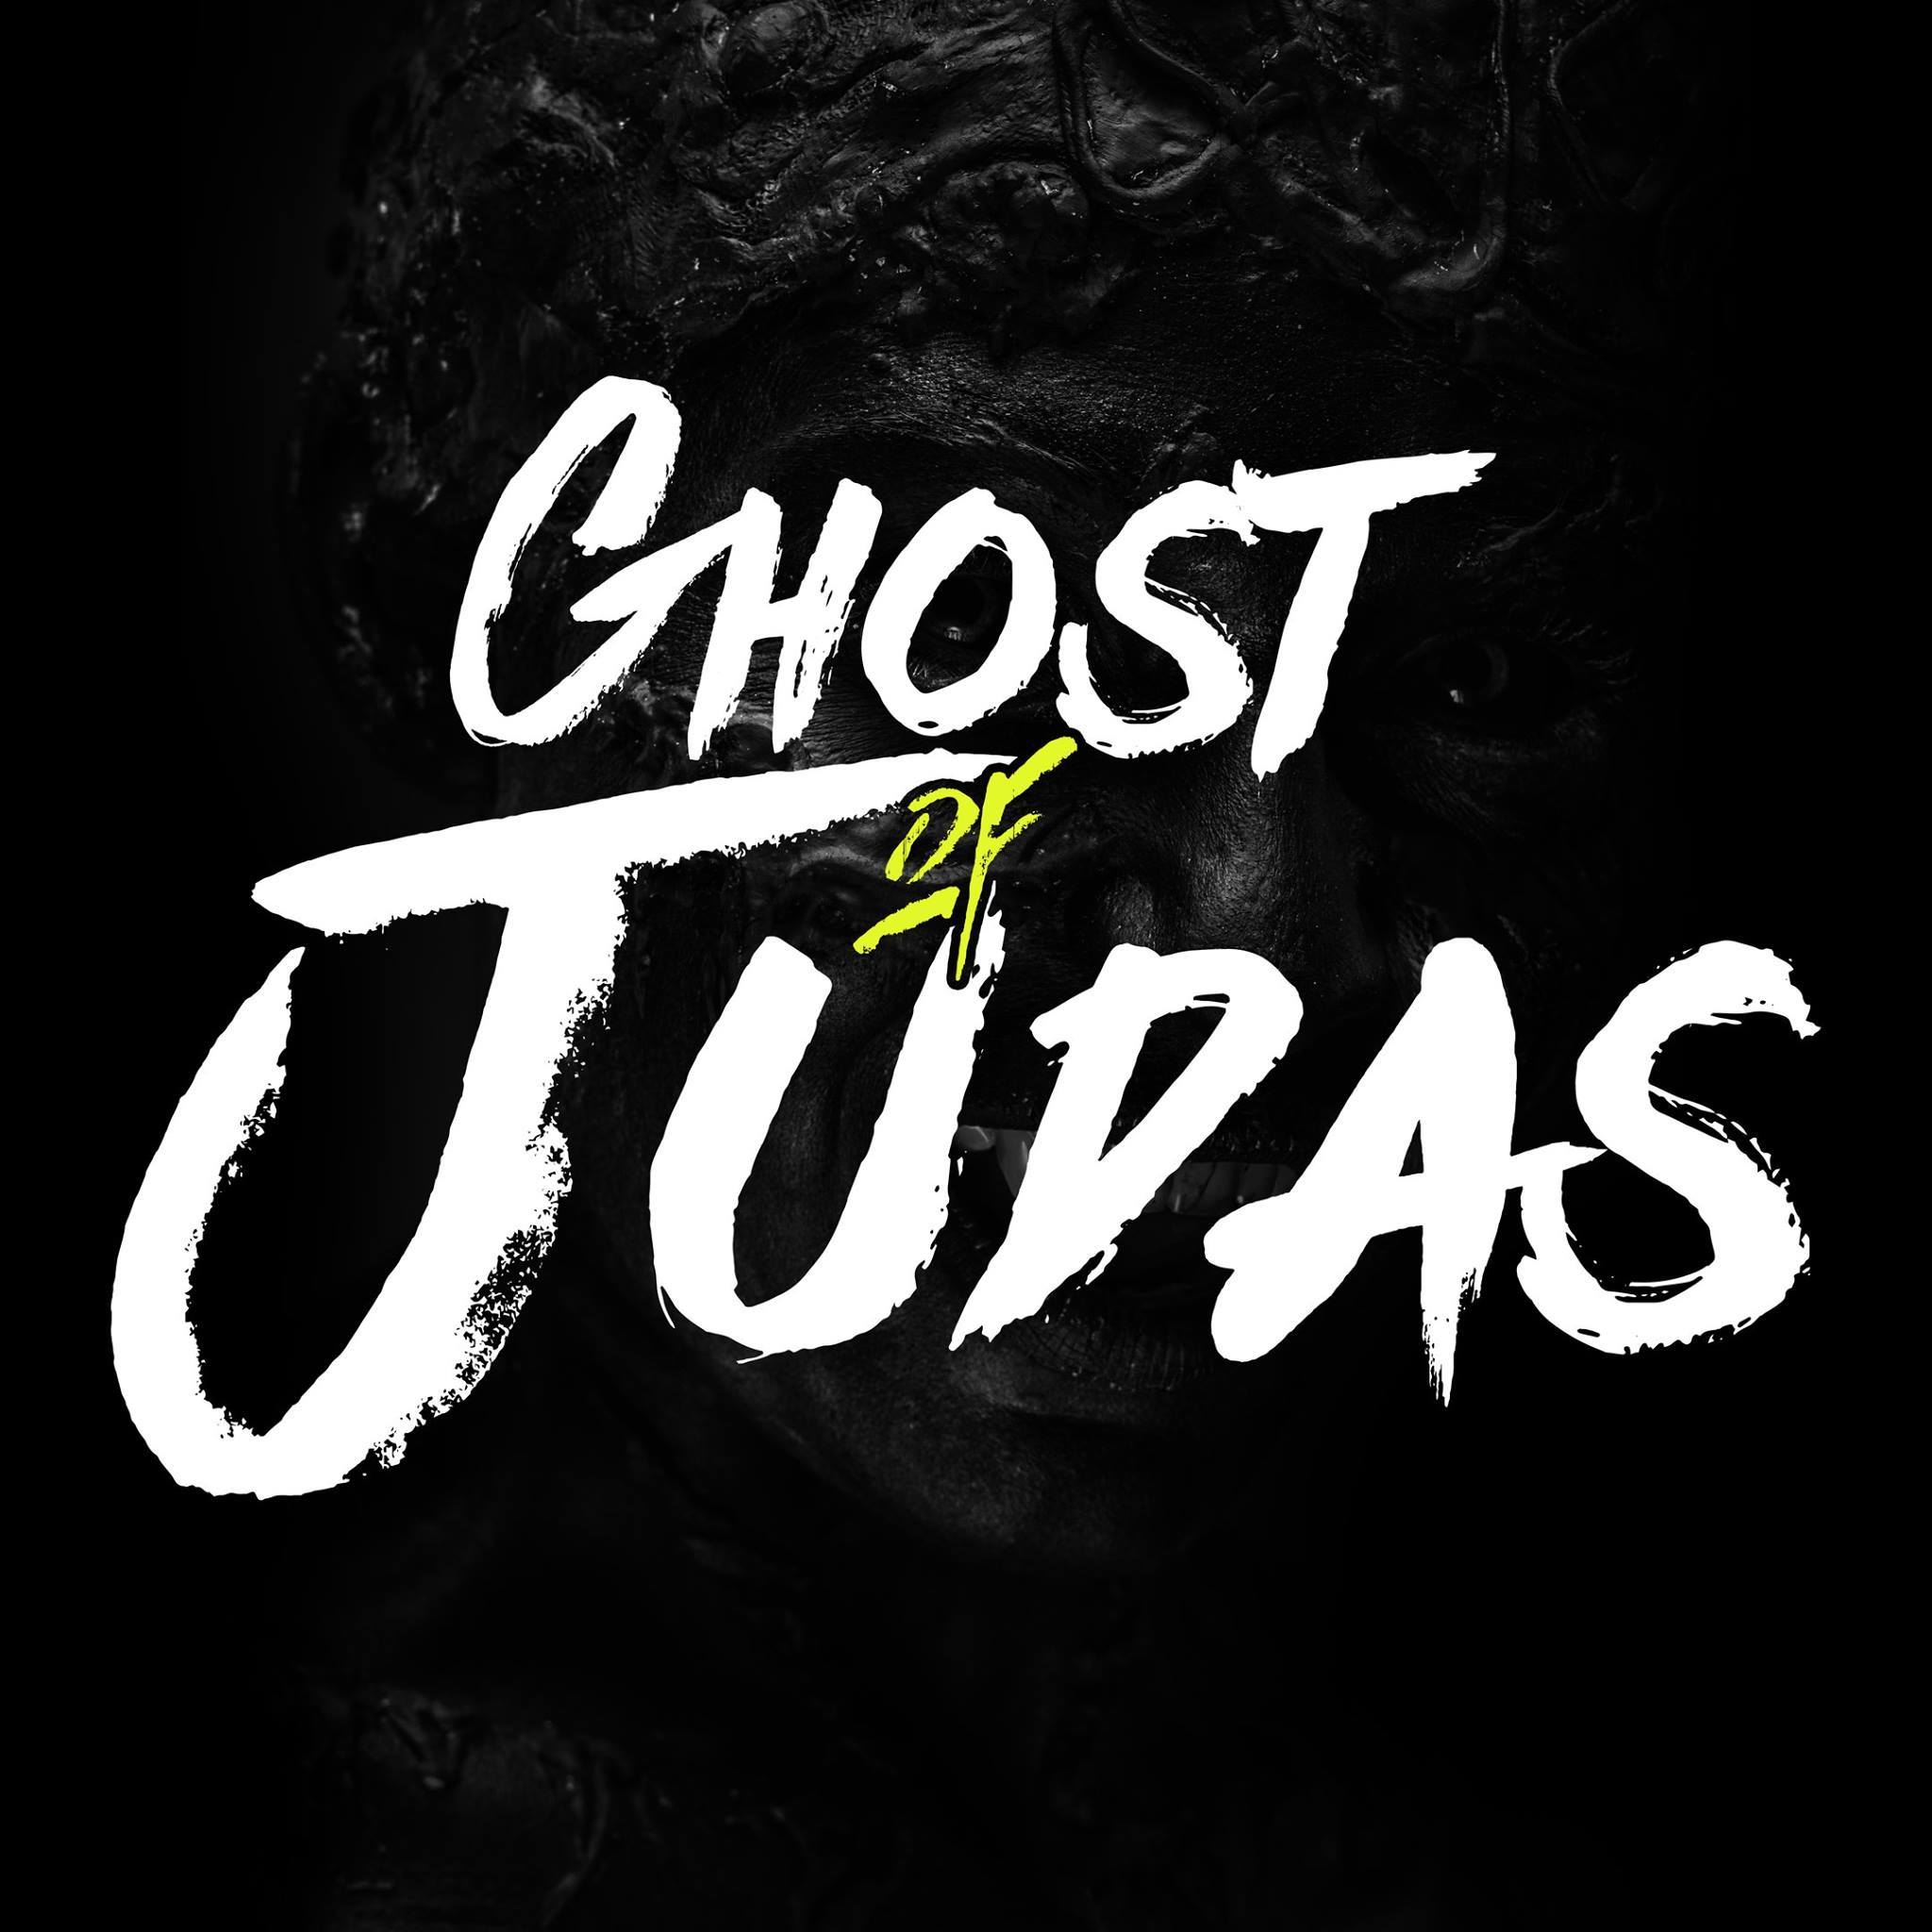 Ghost of Judas